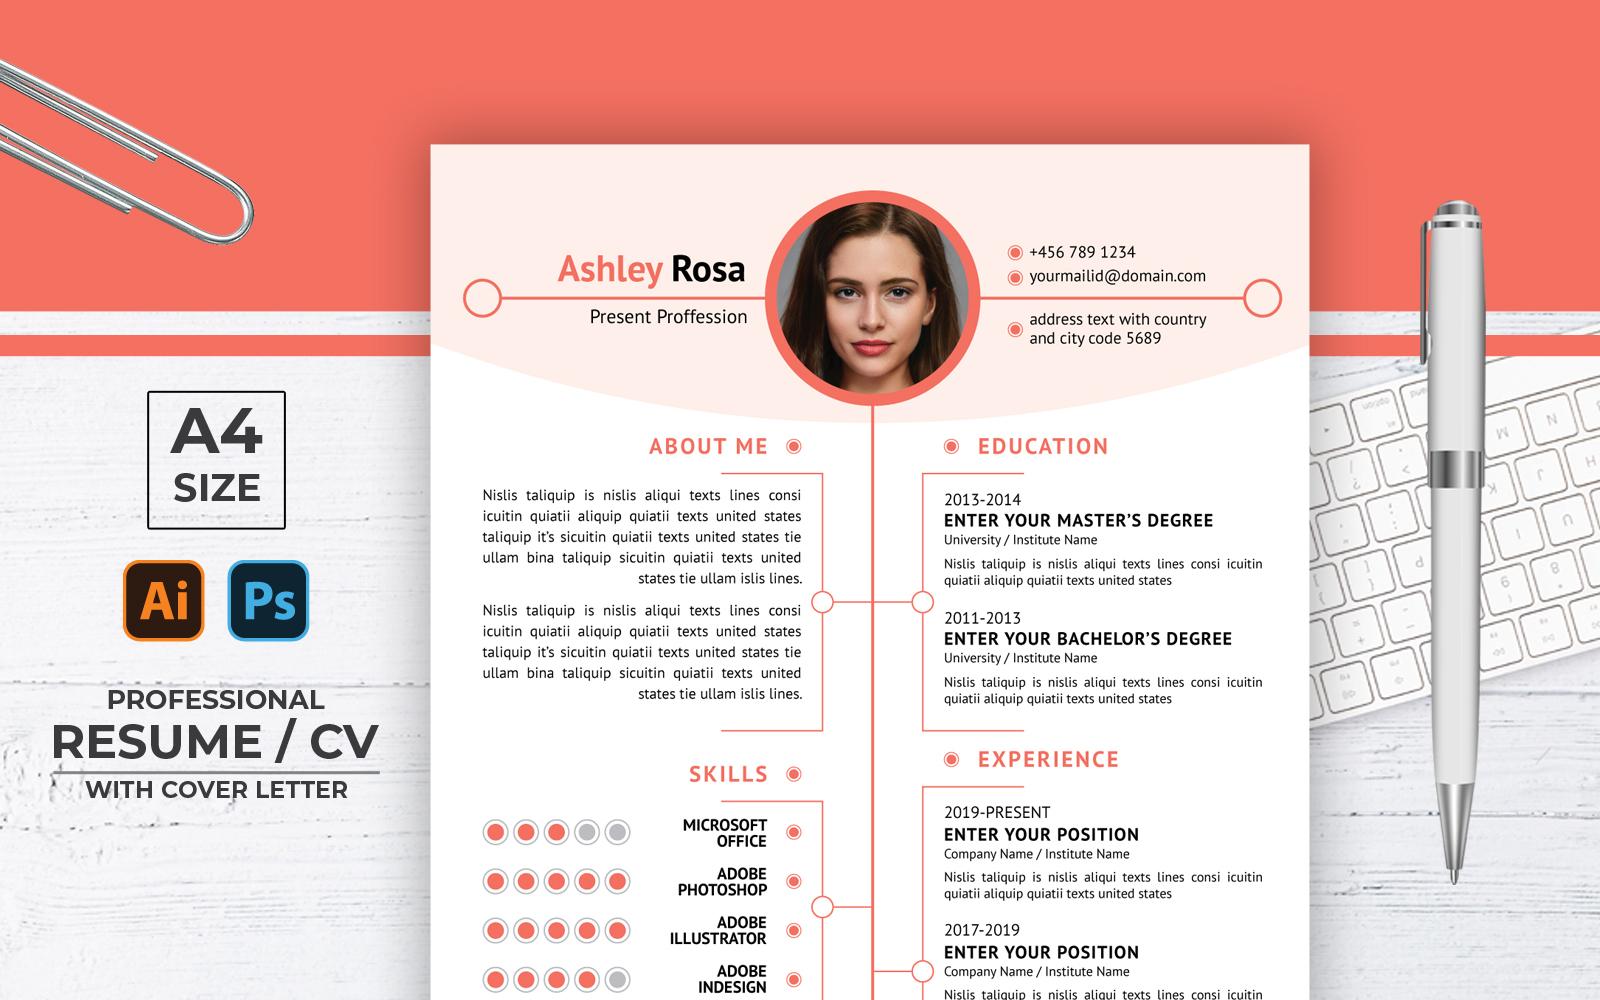 """Ashley Rosa Creative CV"" modèle de CV  #123162"